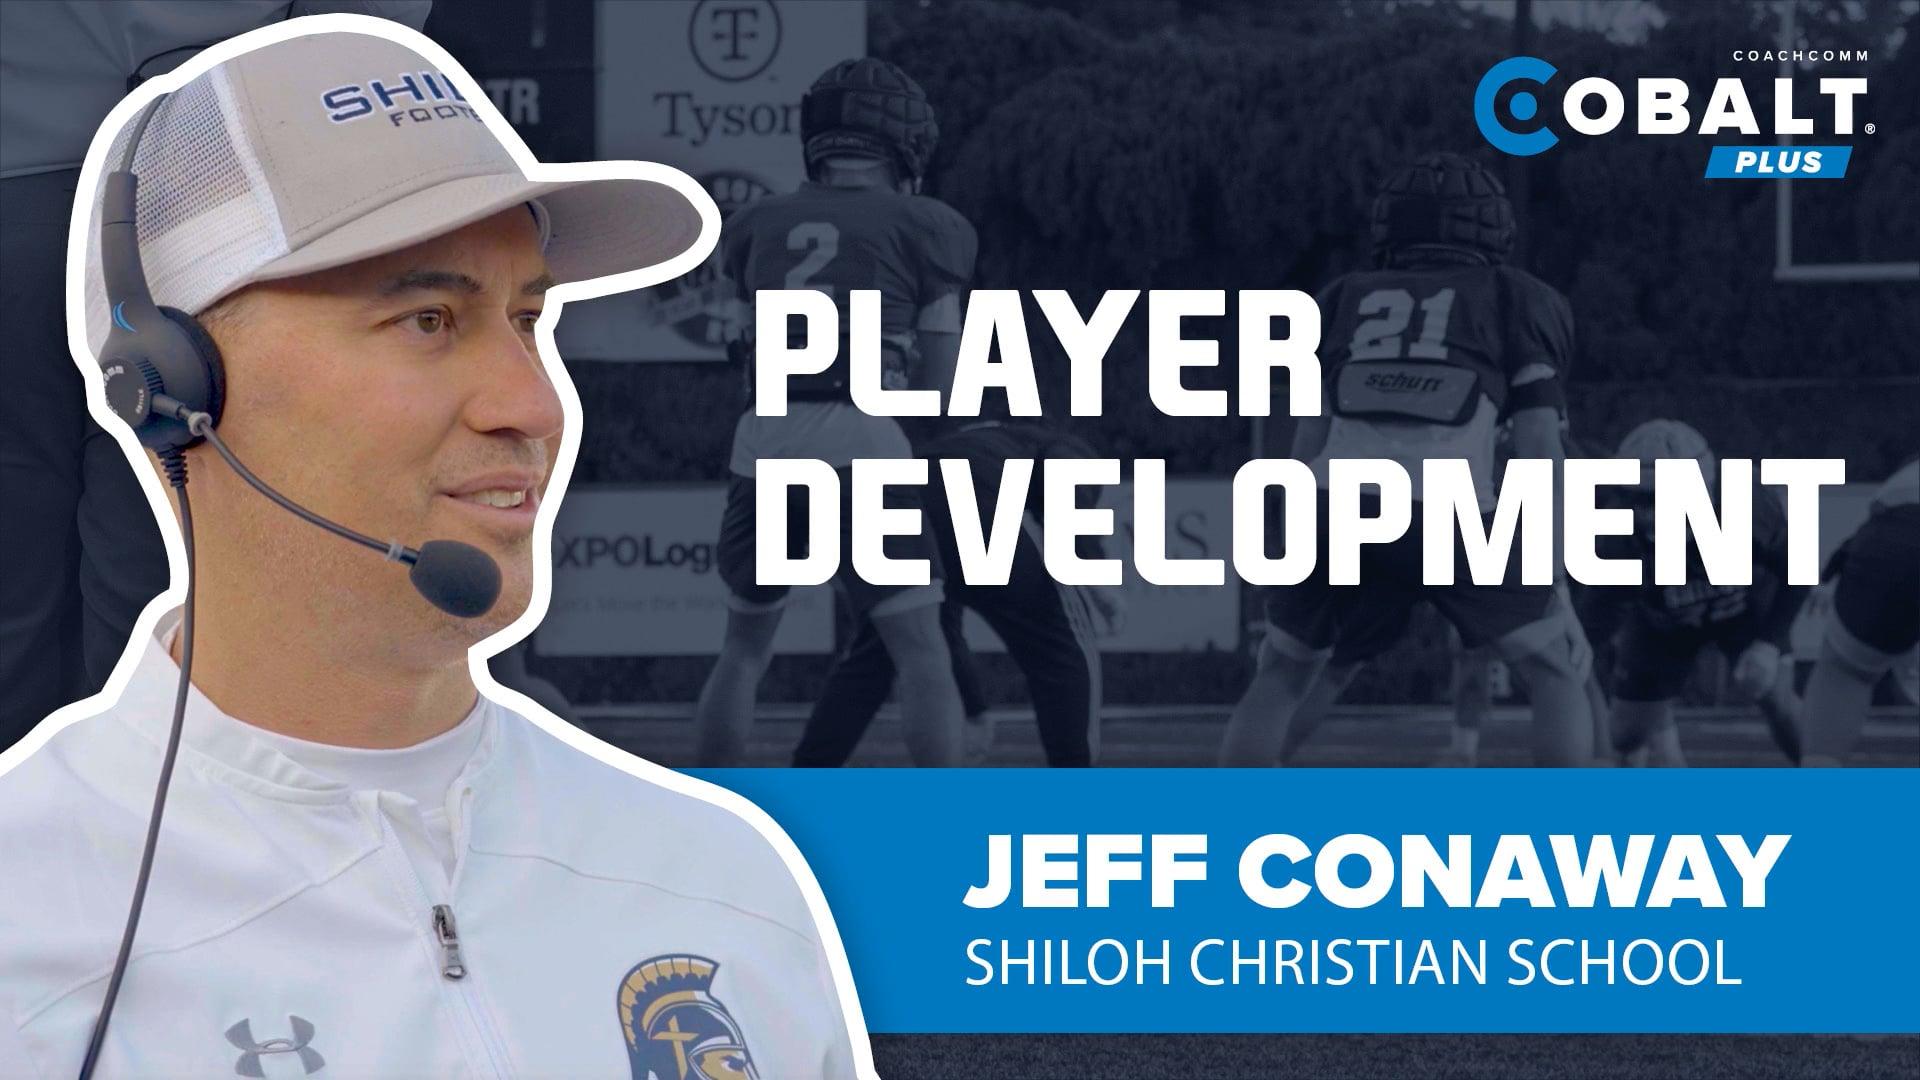 Cobalt PLUS and Player Development